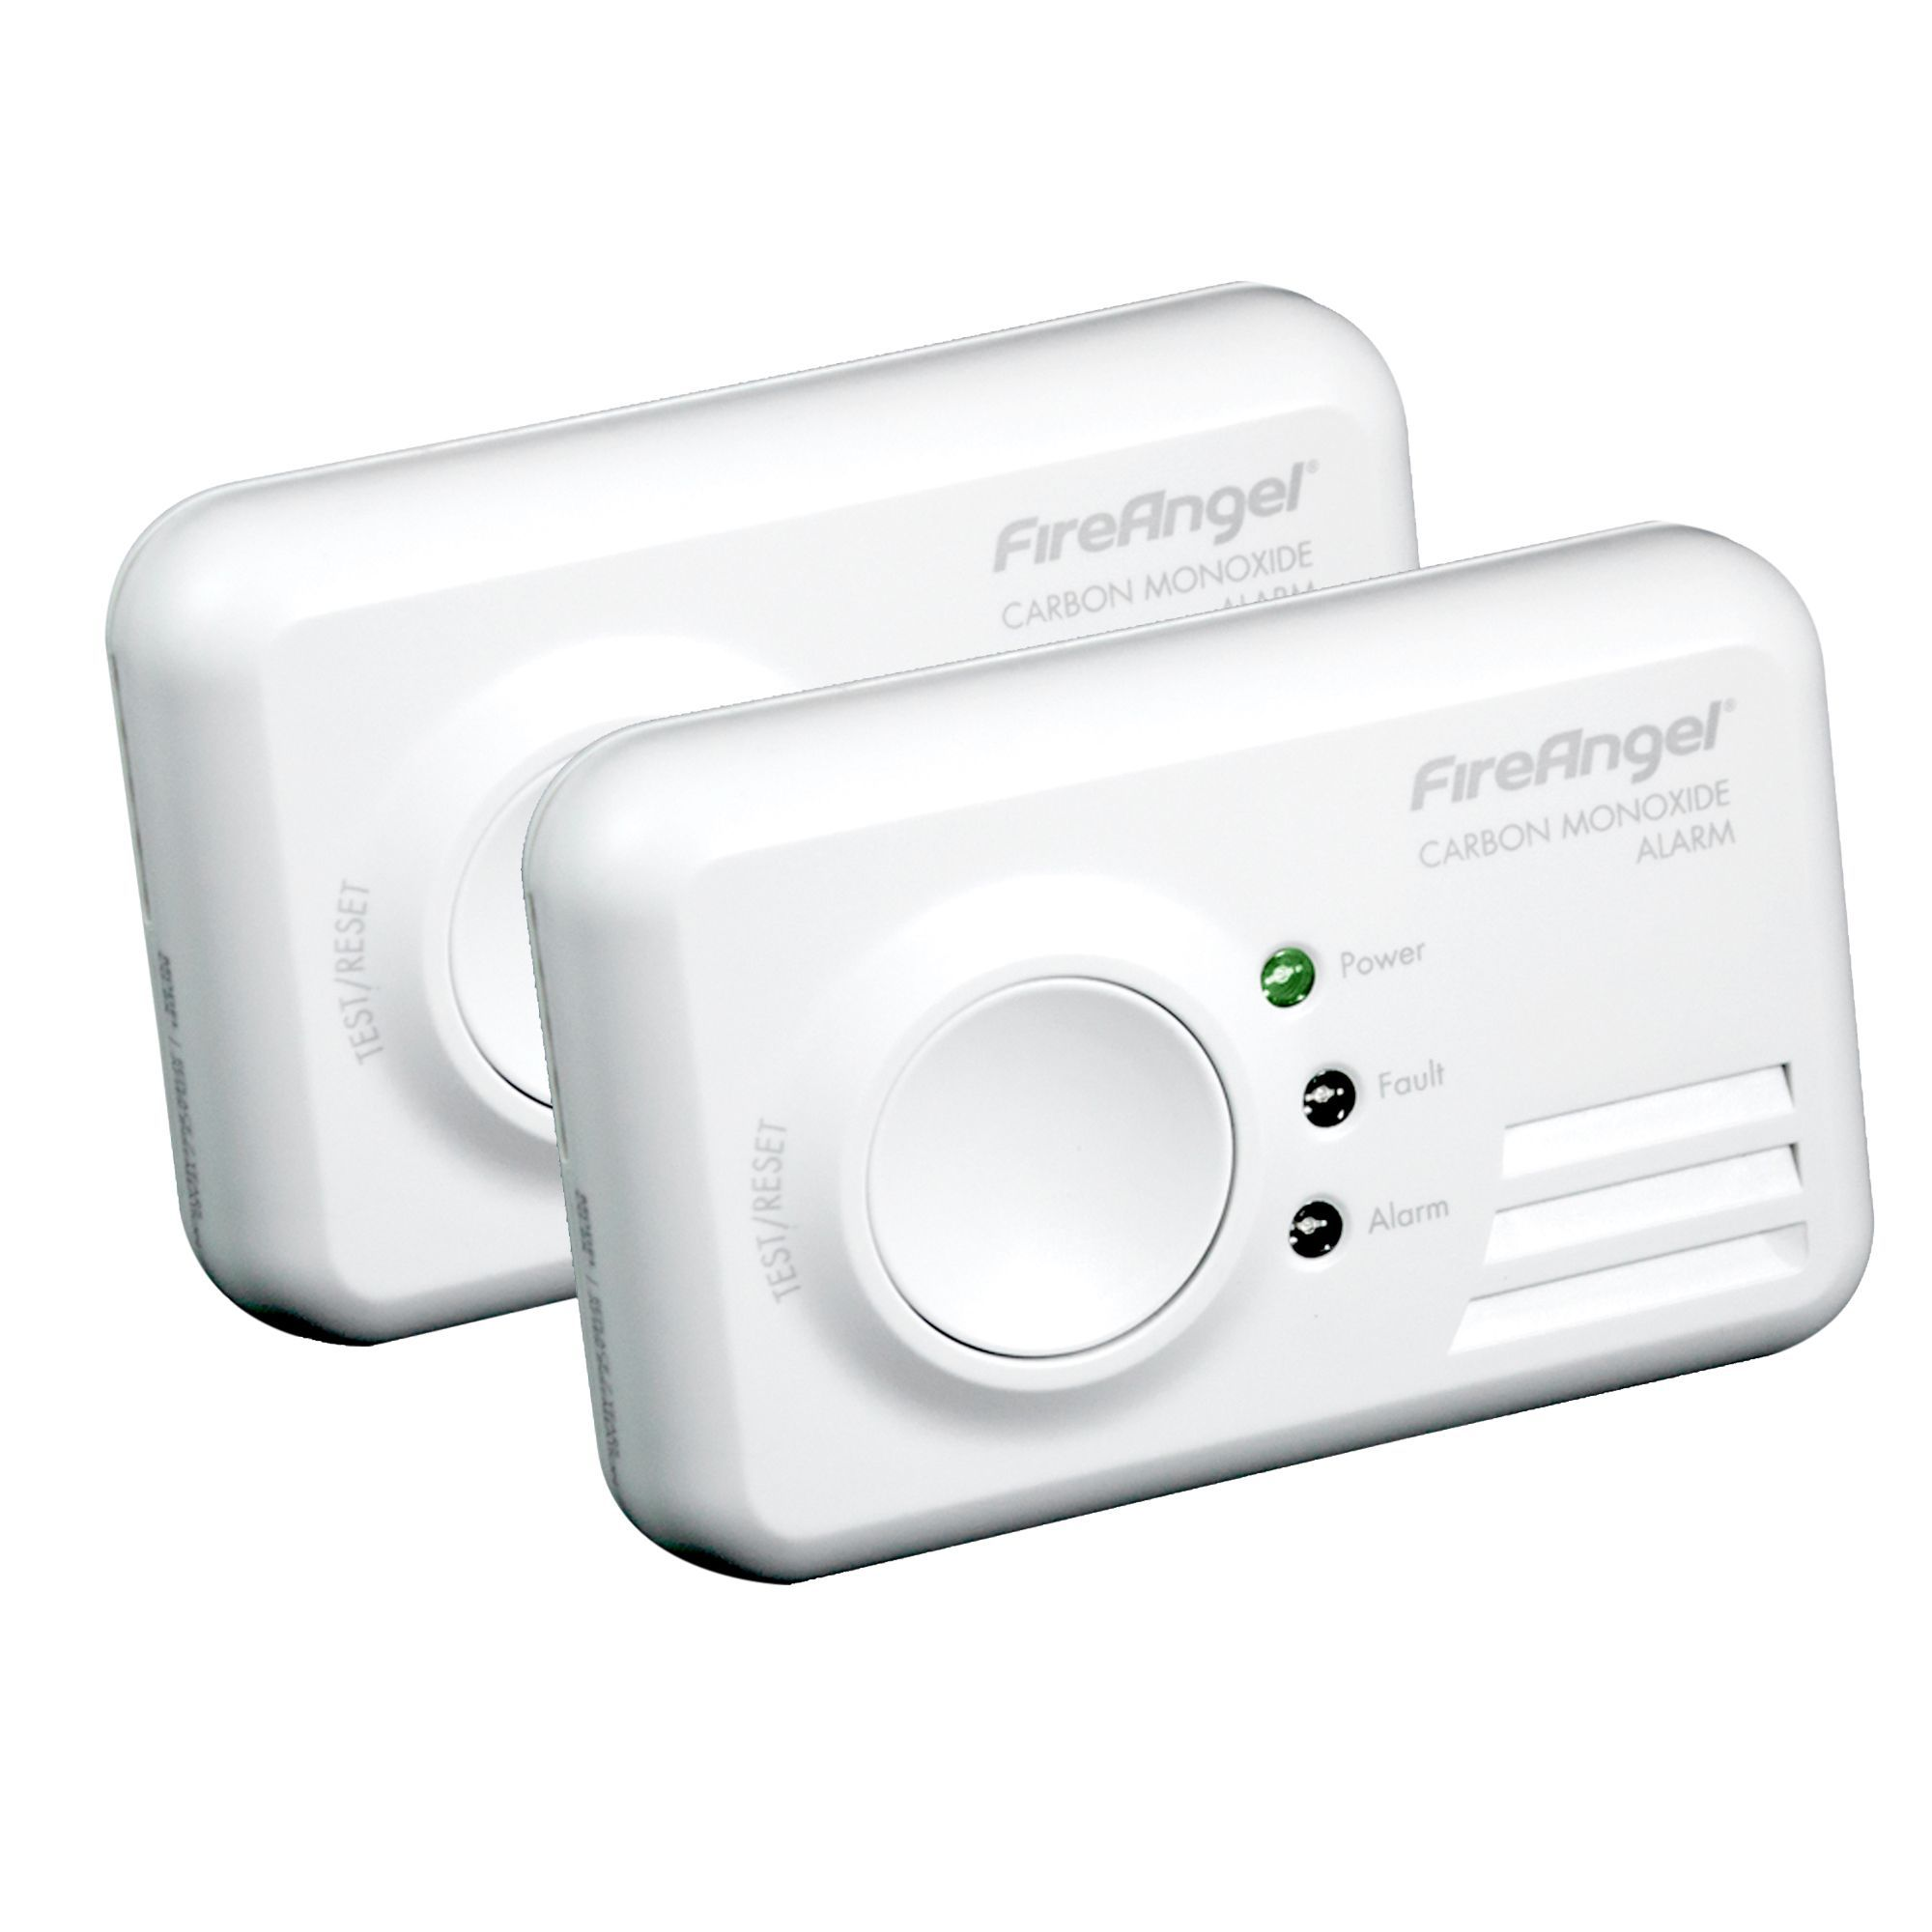 Fireangel Led Display Co Alarm, Pack Of 2